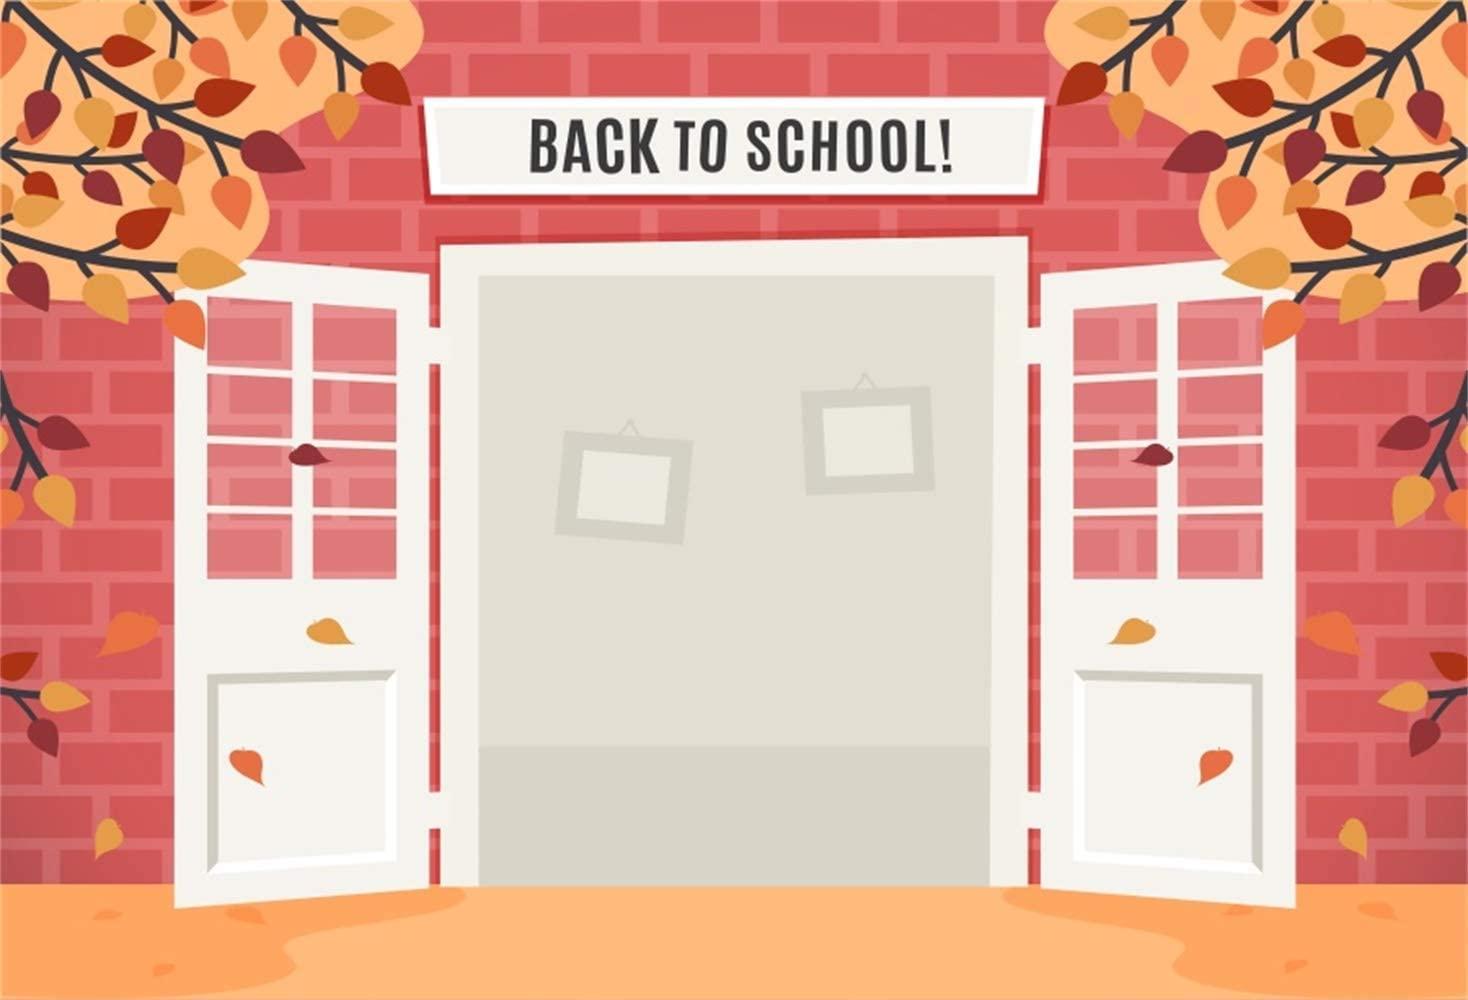 10x8ft Back to School Backdrop Vinyl Cartoon Opened School Gate Maple Trees Brick Wall Illustration Photography Background Pupil Kindergarten Students Portrait Classroom Decors Wallpaper